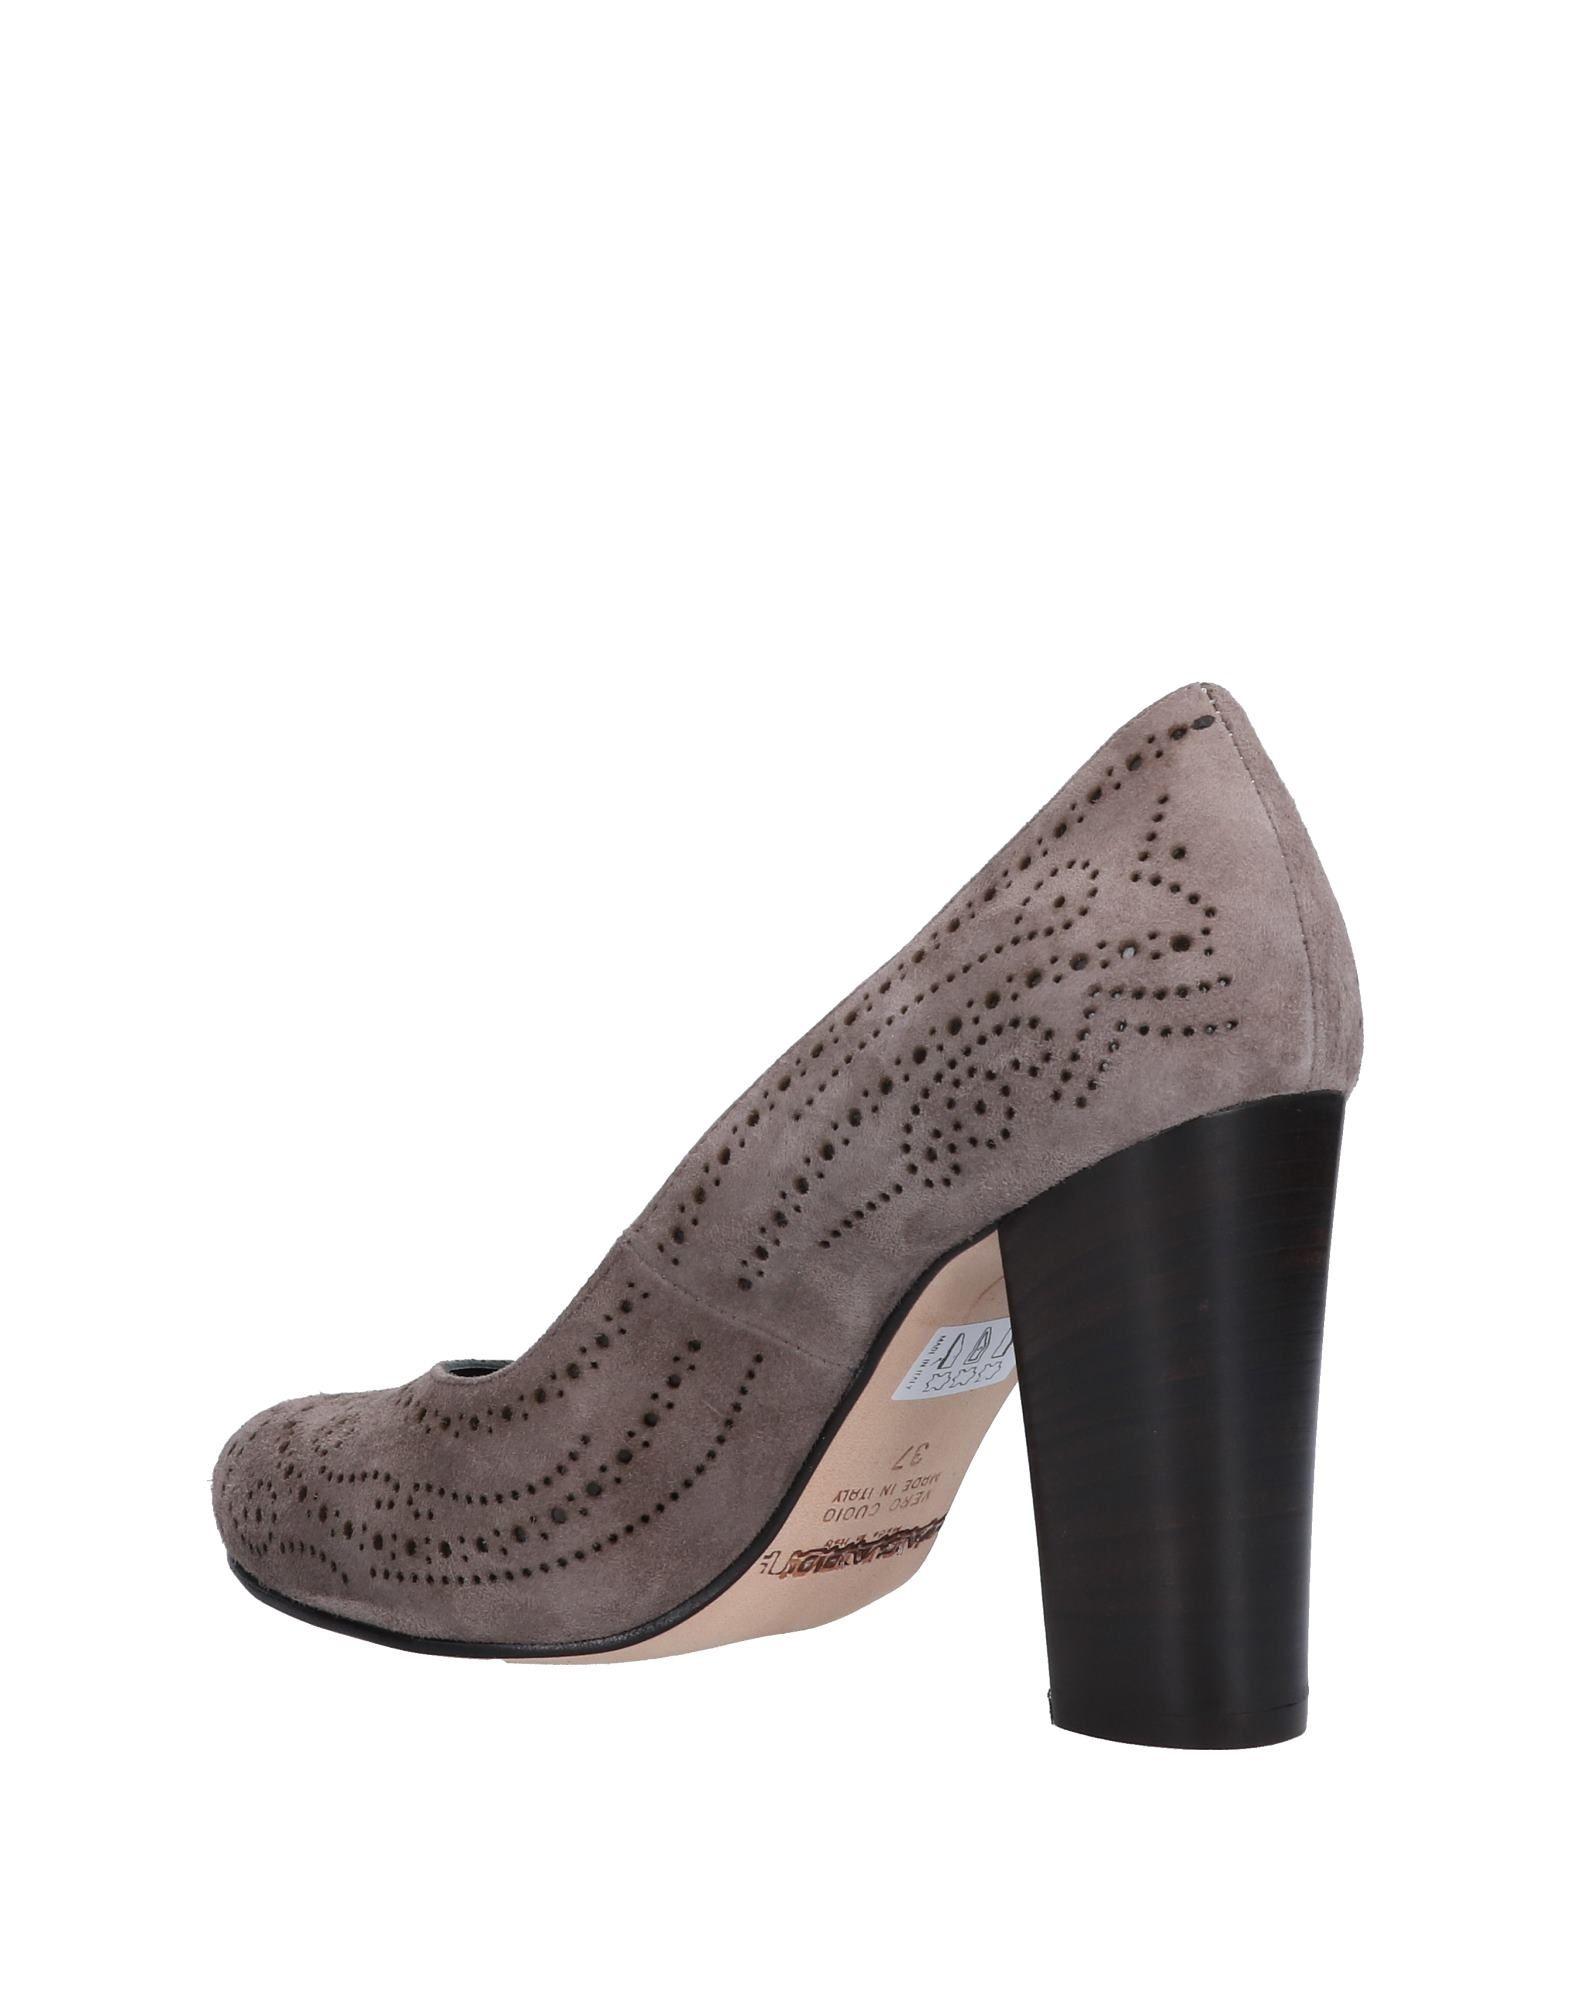 Luca Valentini Pumps Damen beliebte  11498846XM Gute Qualität beliebte Damen Schuhe a364ec